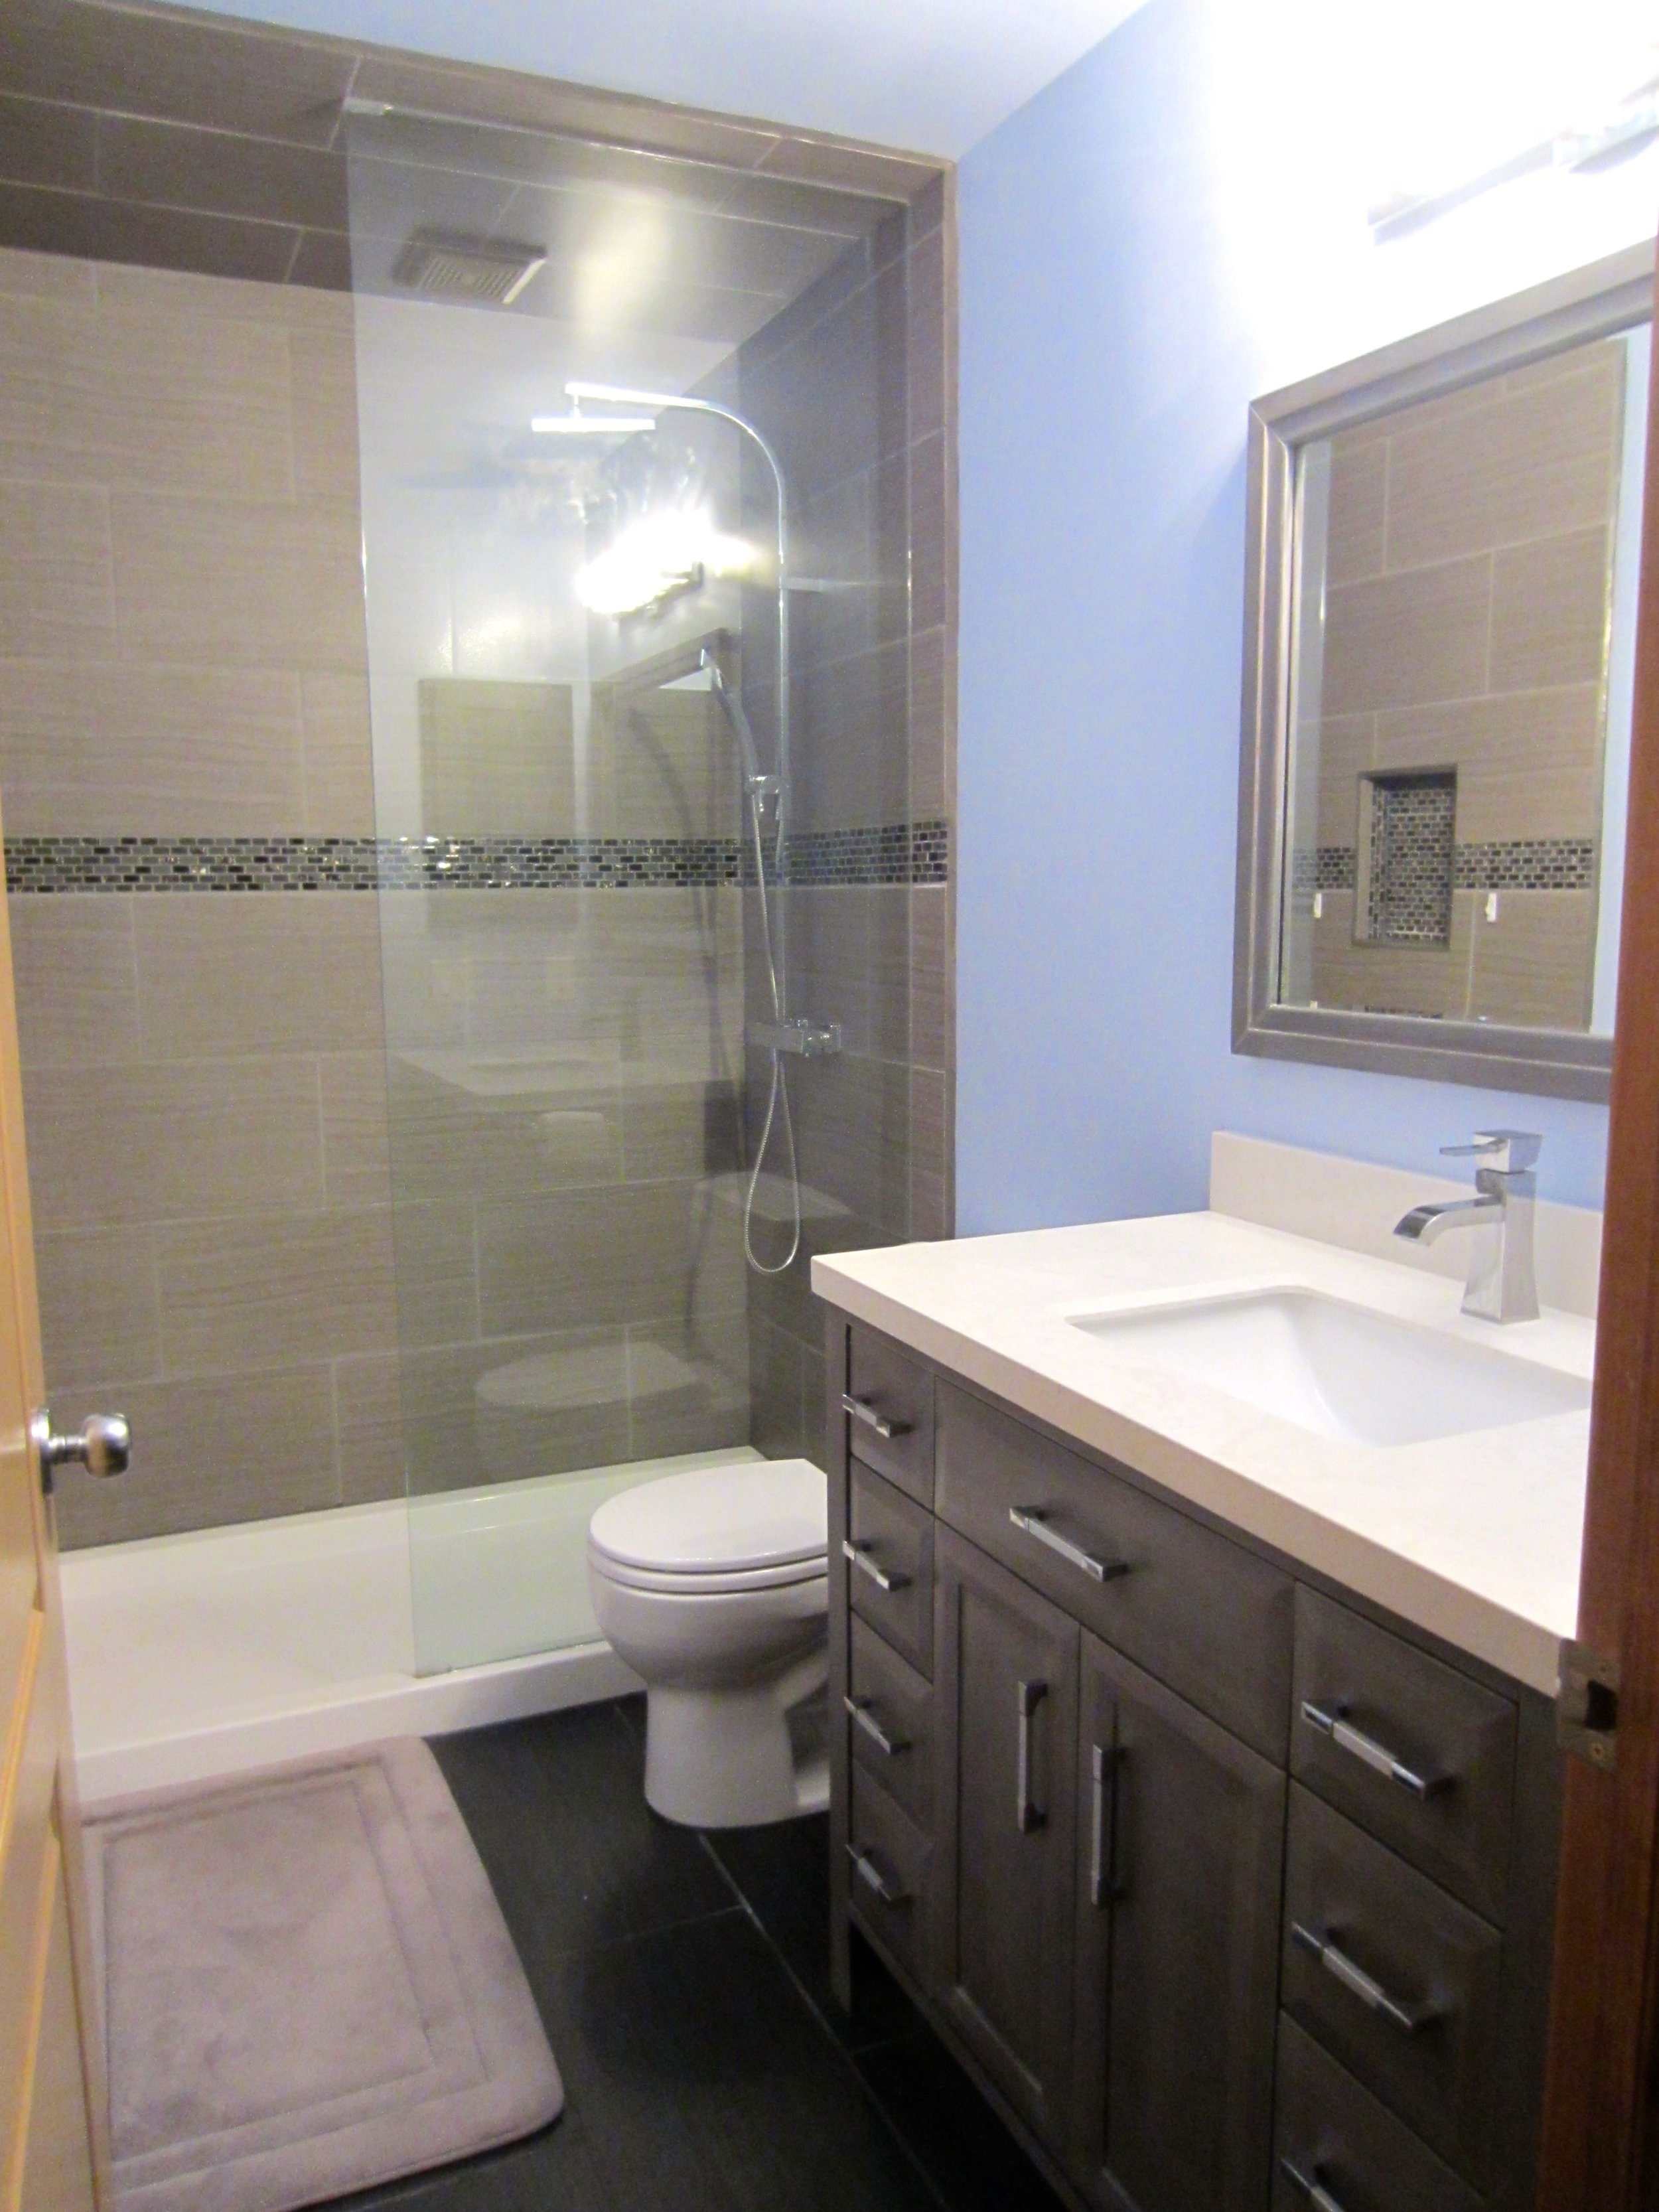 Bathroom renovations in Kimberley, BC.